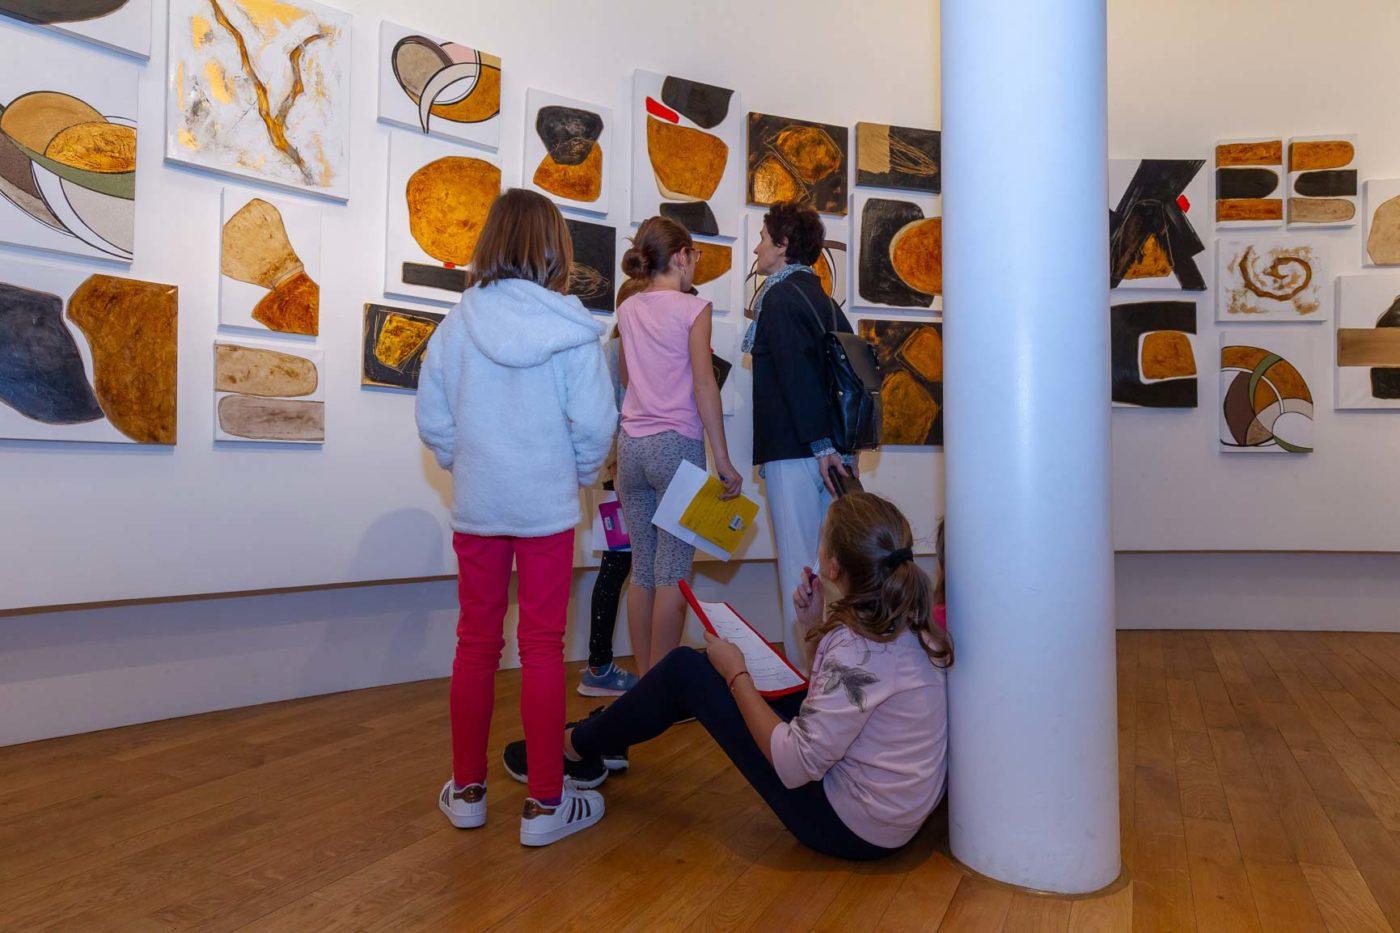 Exposition Kardesch Variations Remise Oeuvre Ville